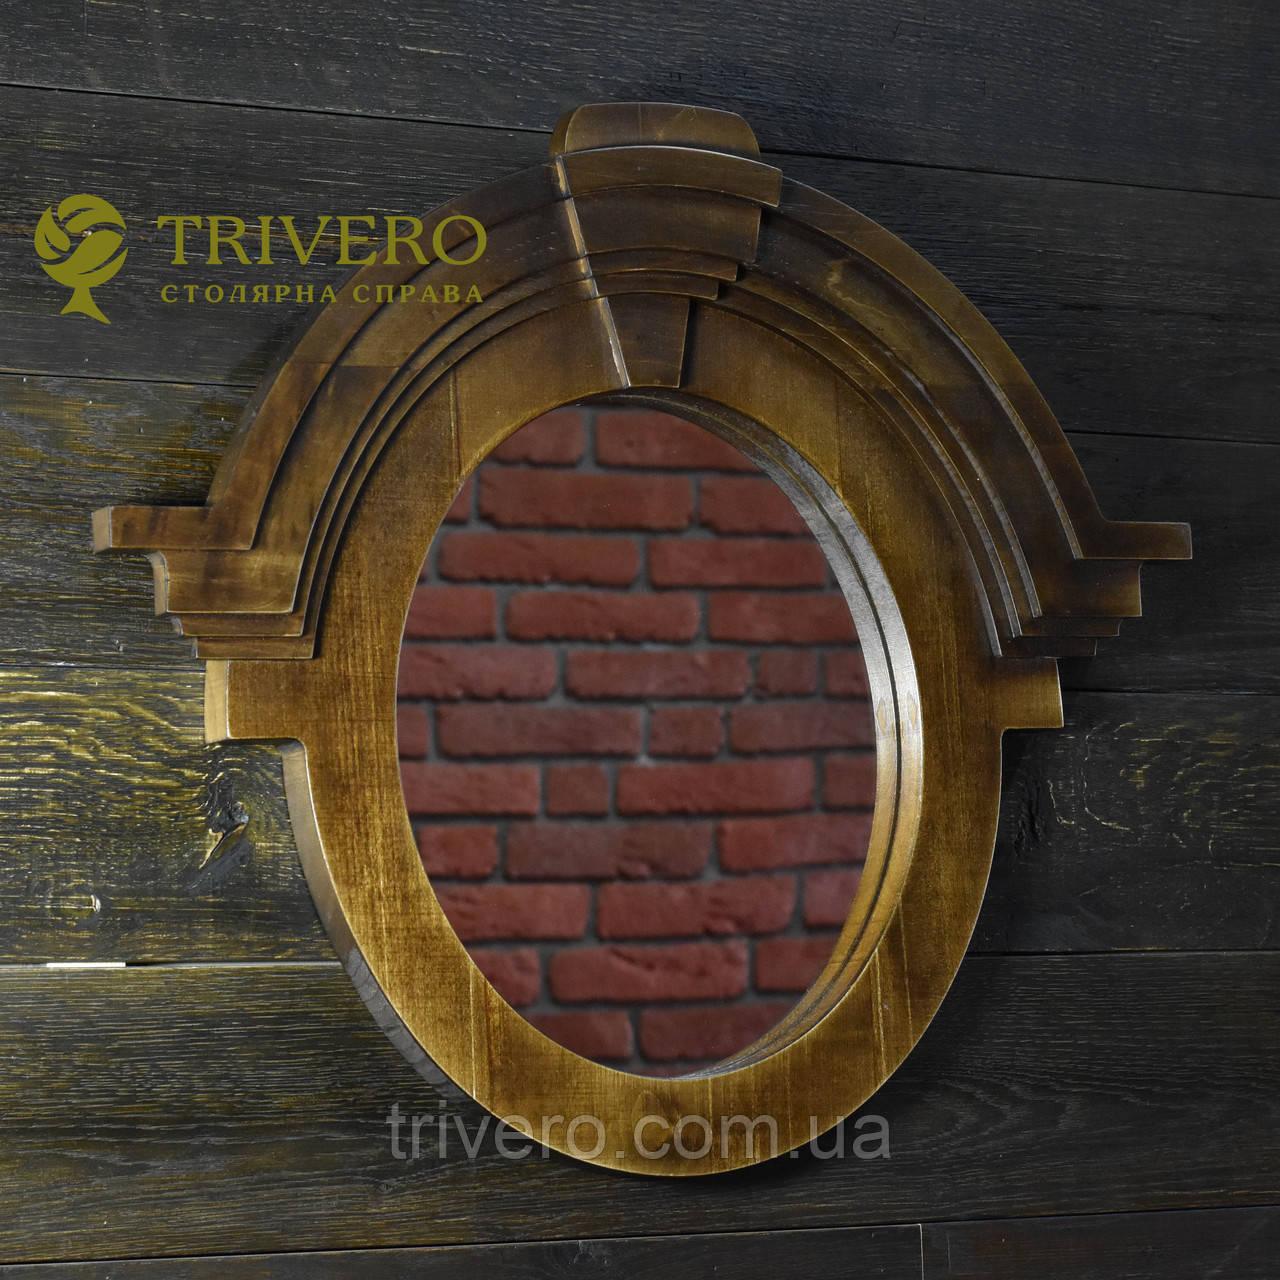 Зеркало в деревянной раме в лофт стиле клен